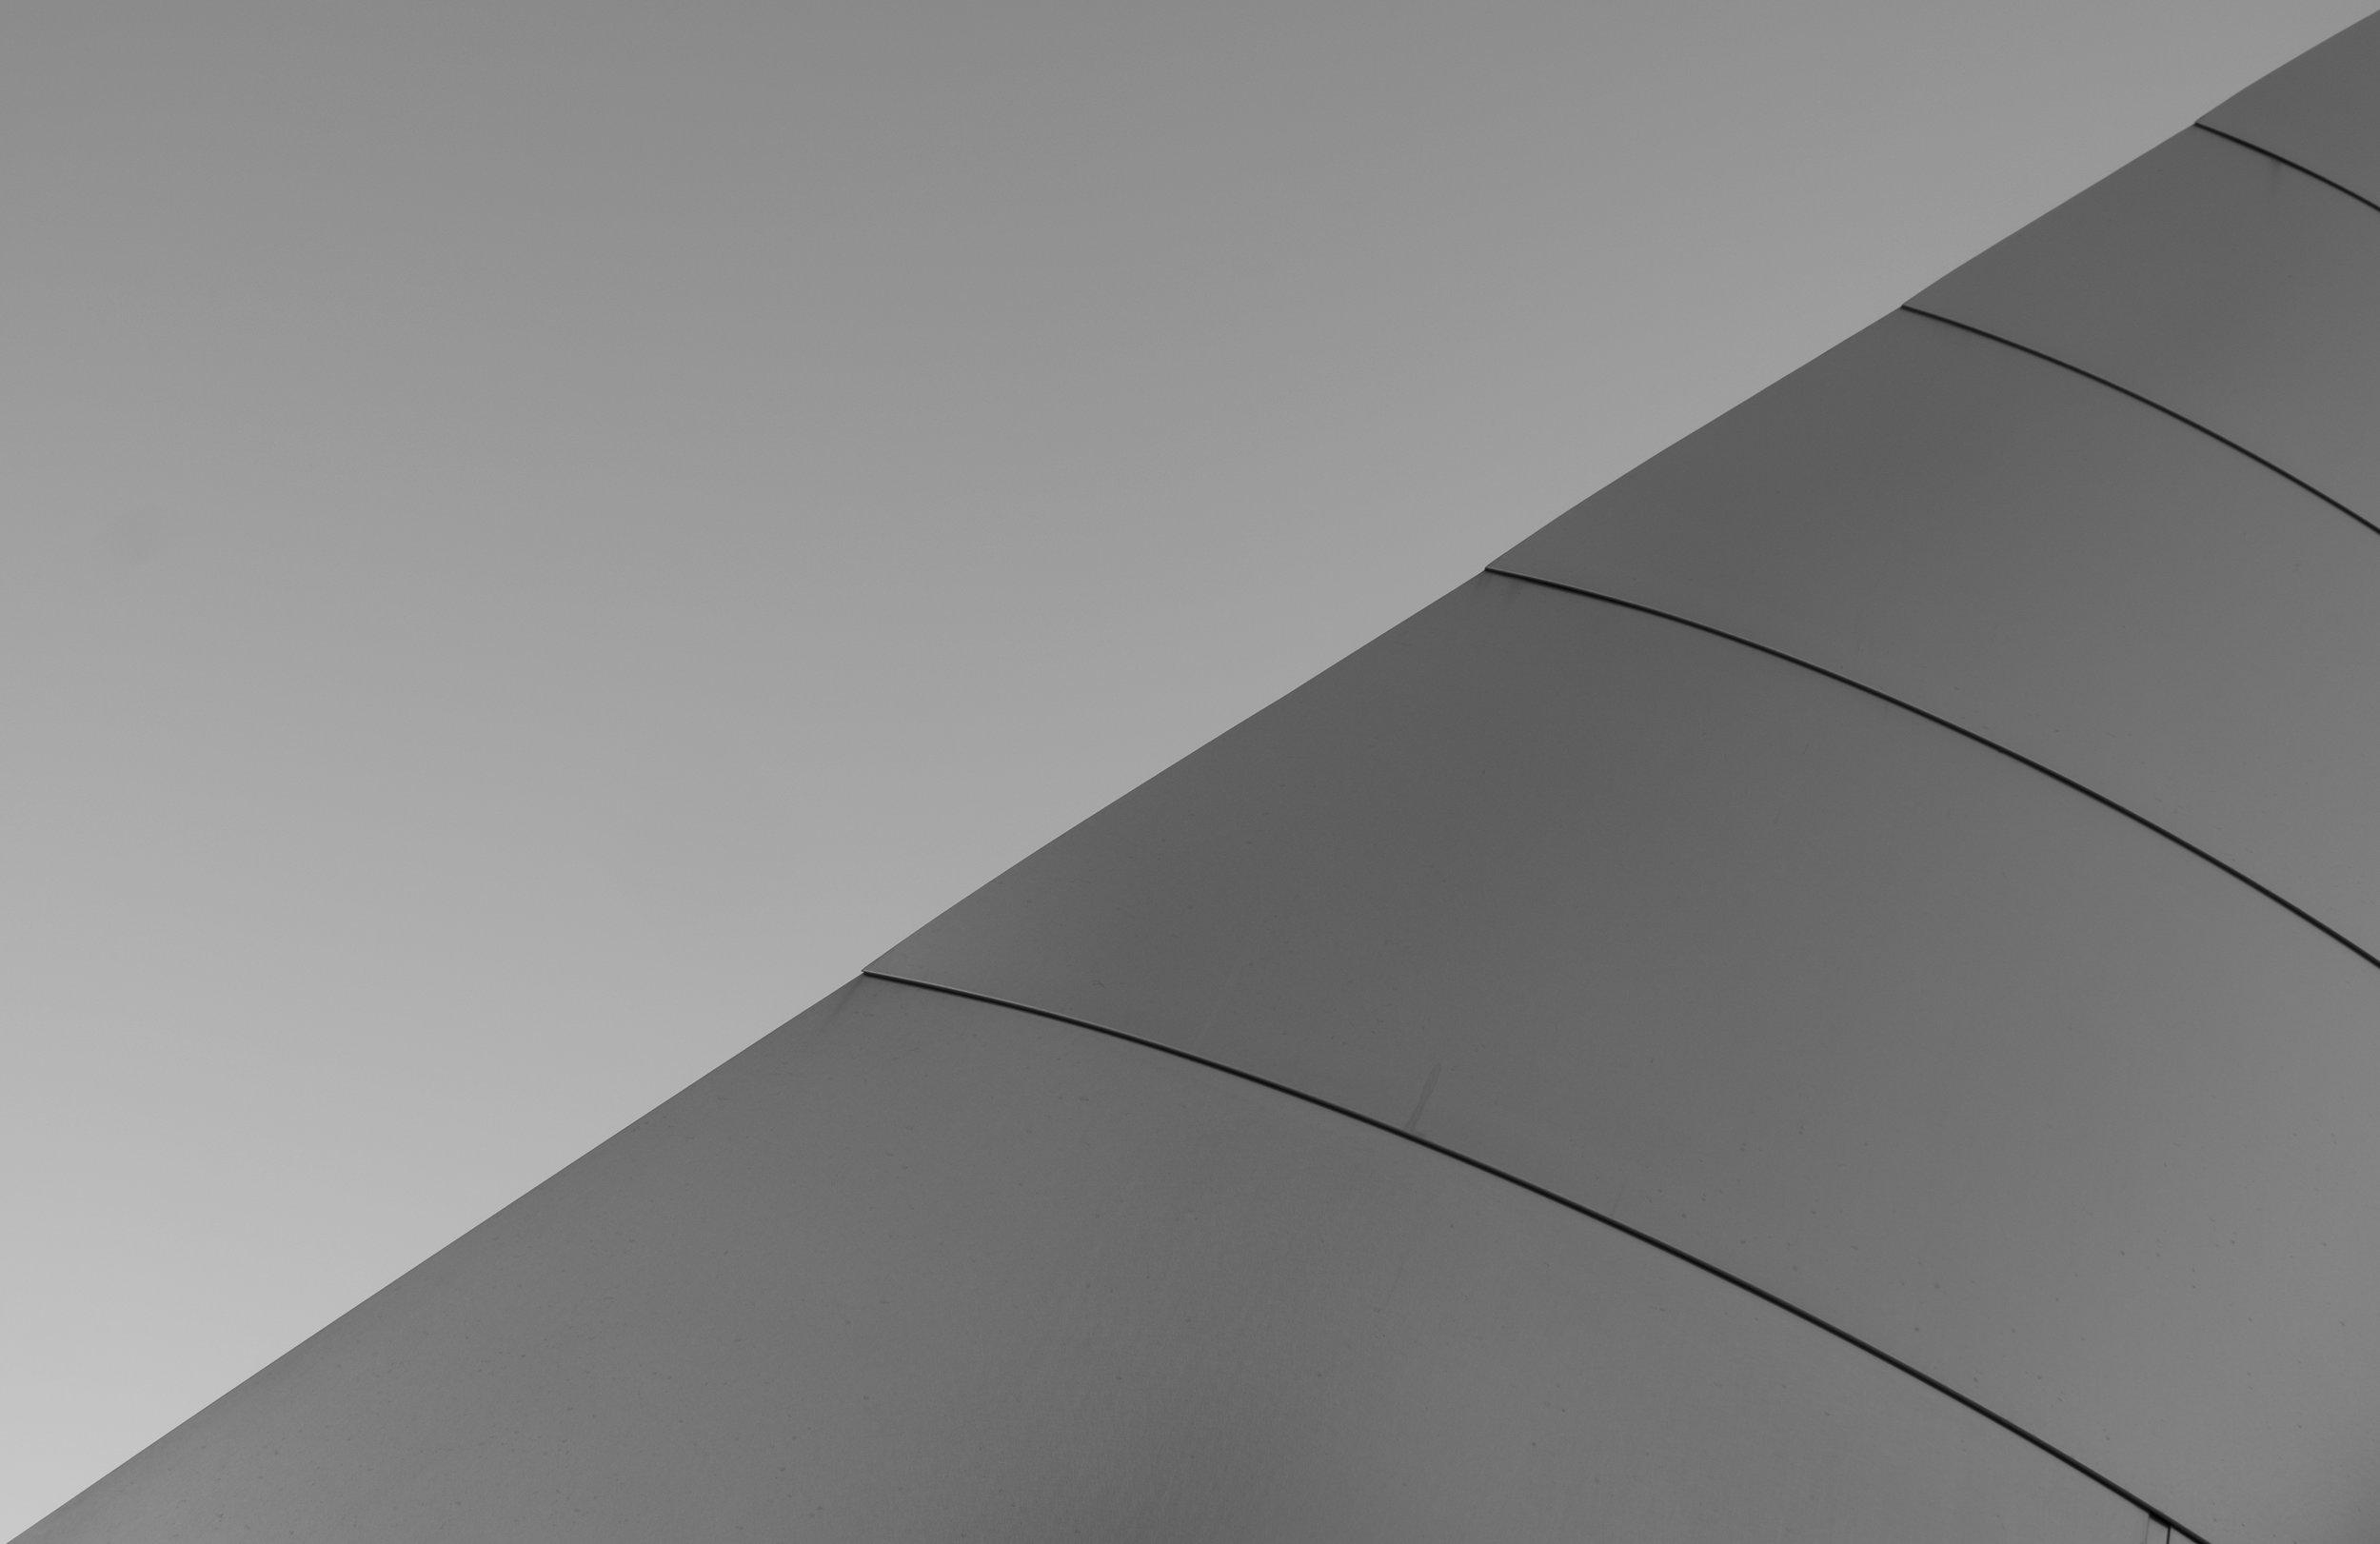 DION-LEE-KIM-JONES-GEHRY-1.jpg